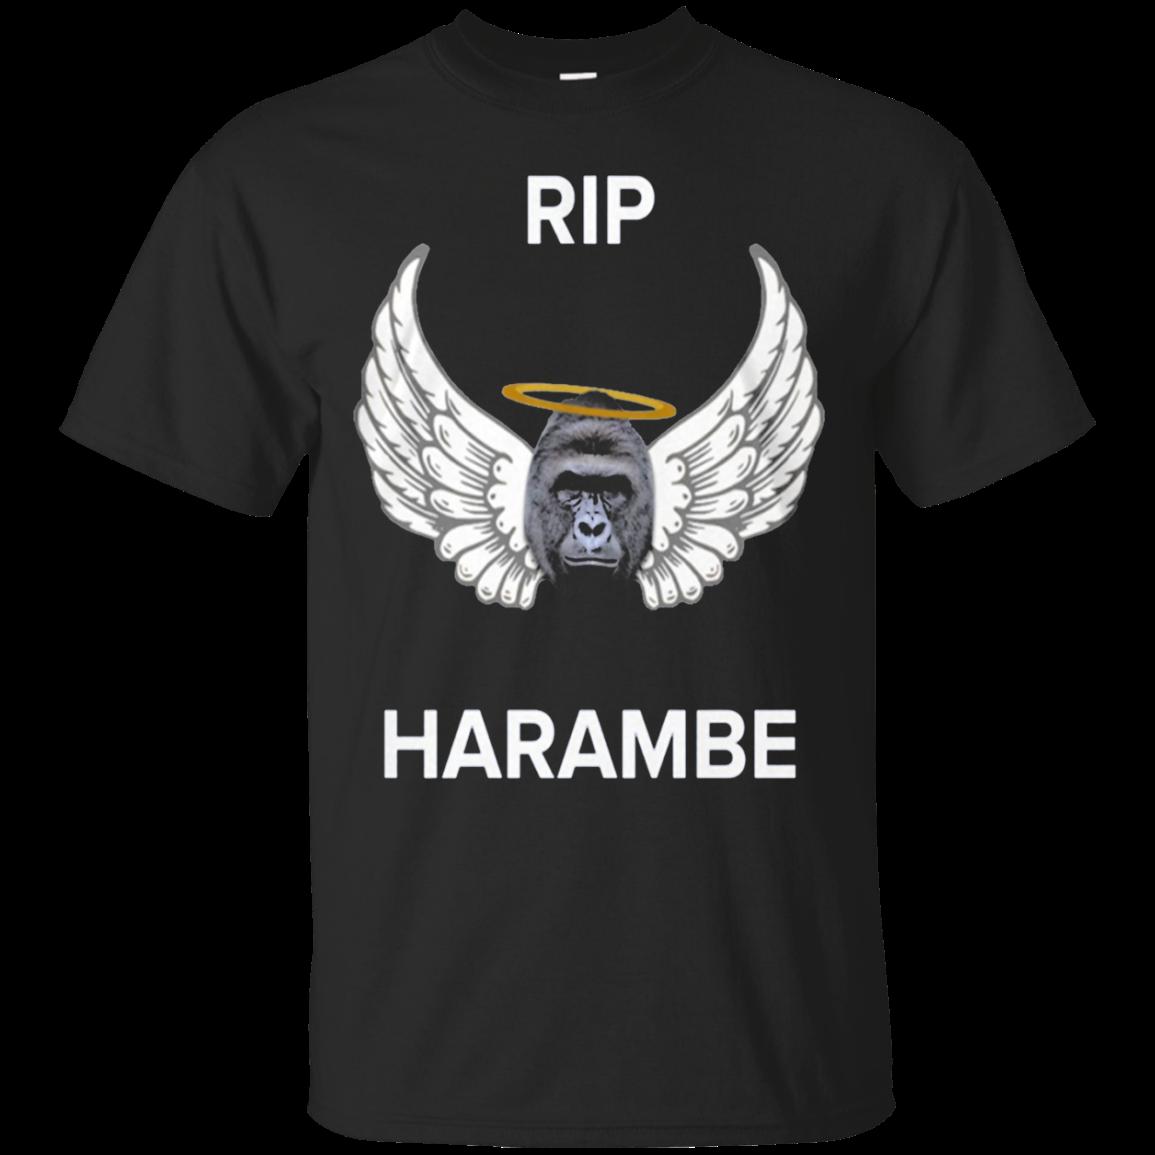 Top Selling Amazing Rip Harambe Shirt Harambeauto